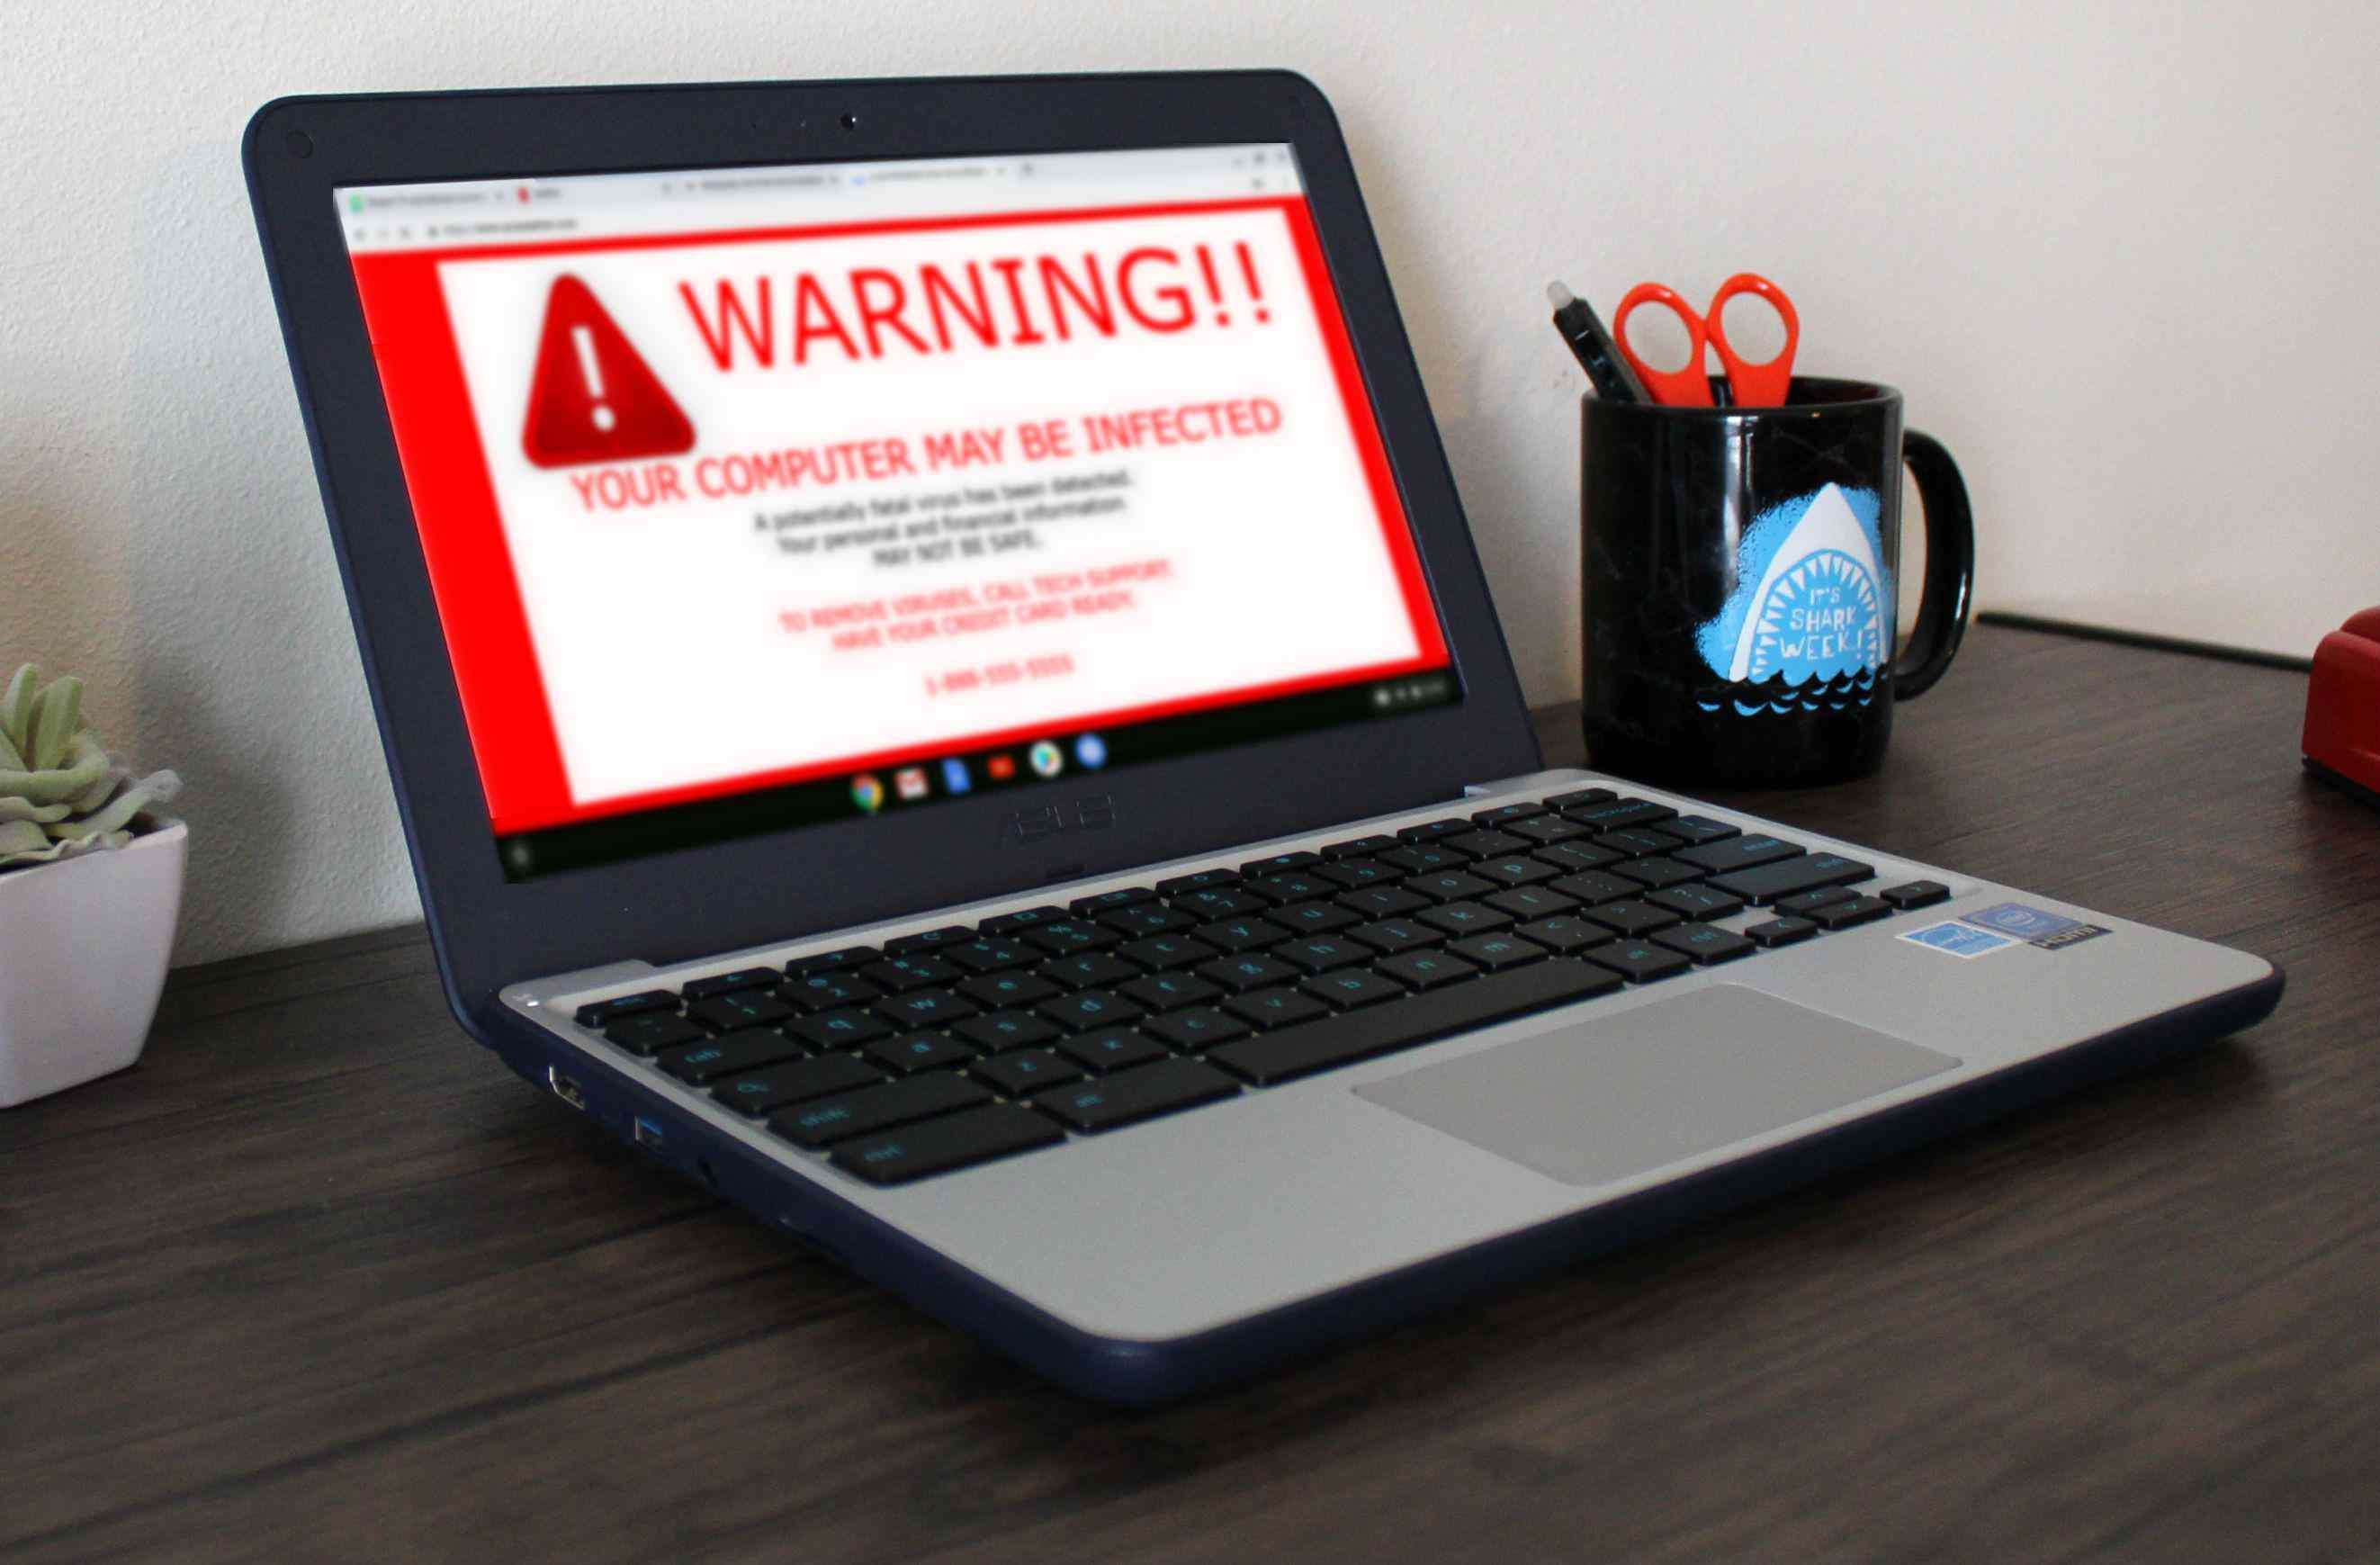 A fake virus warning displayed on a Chromebook.